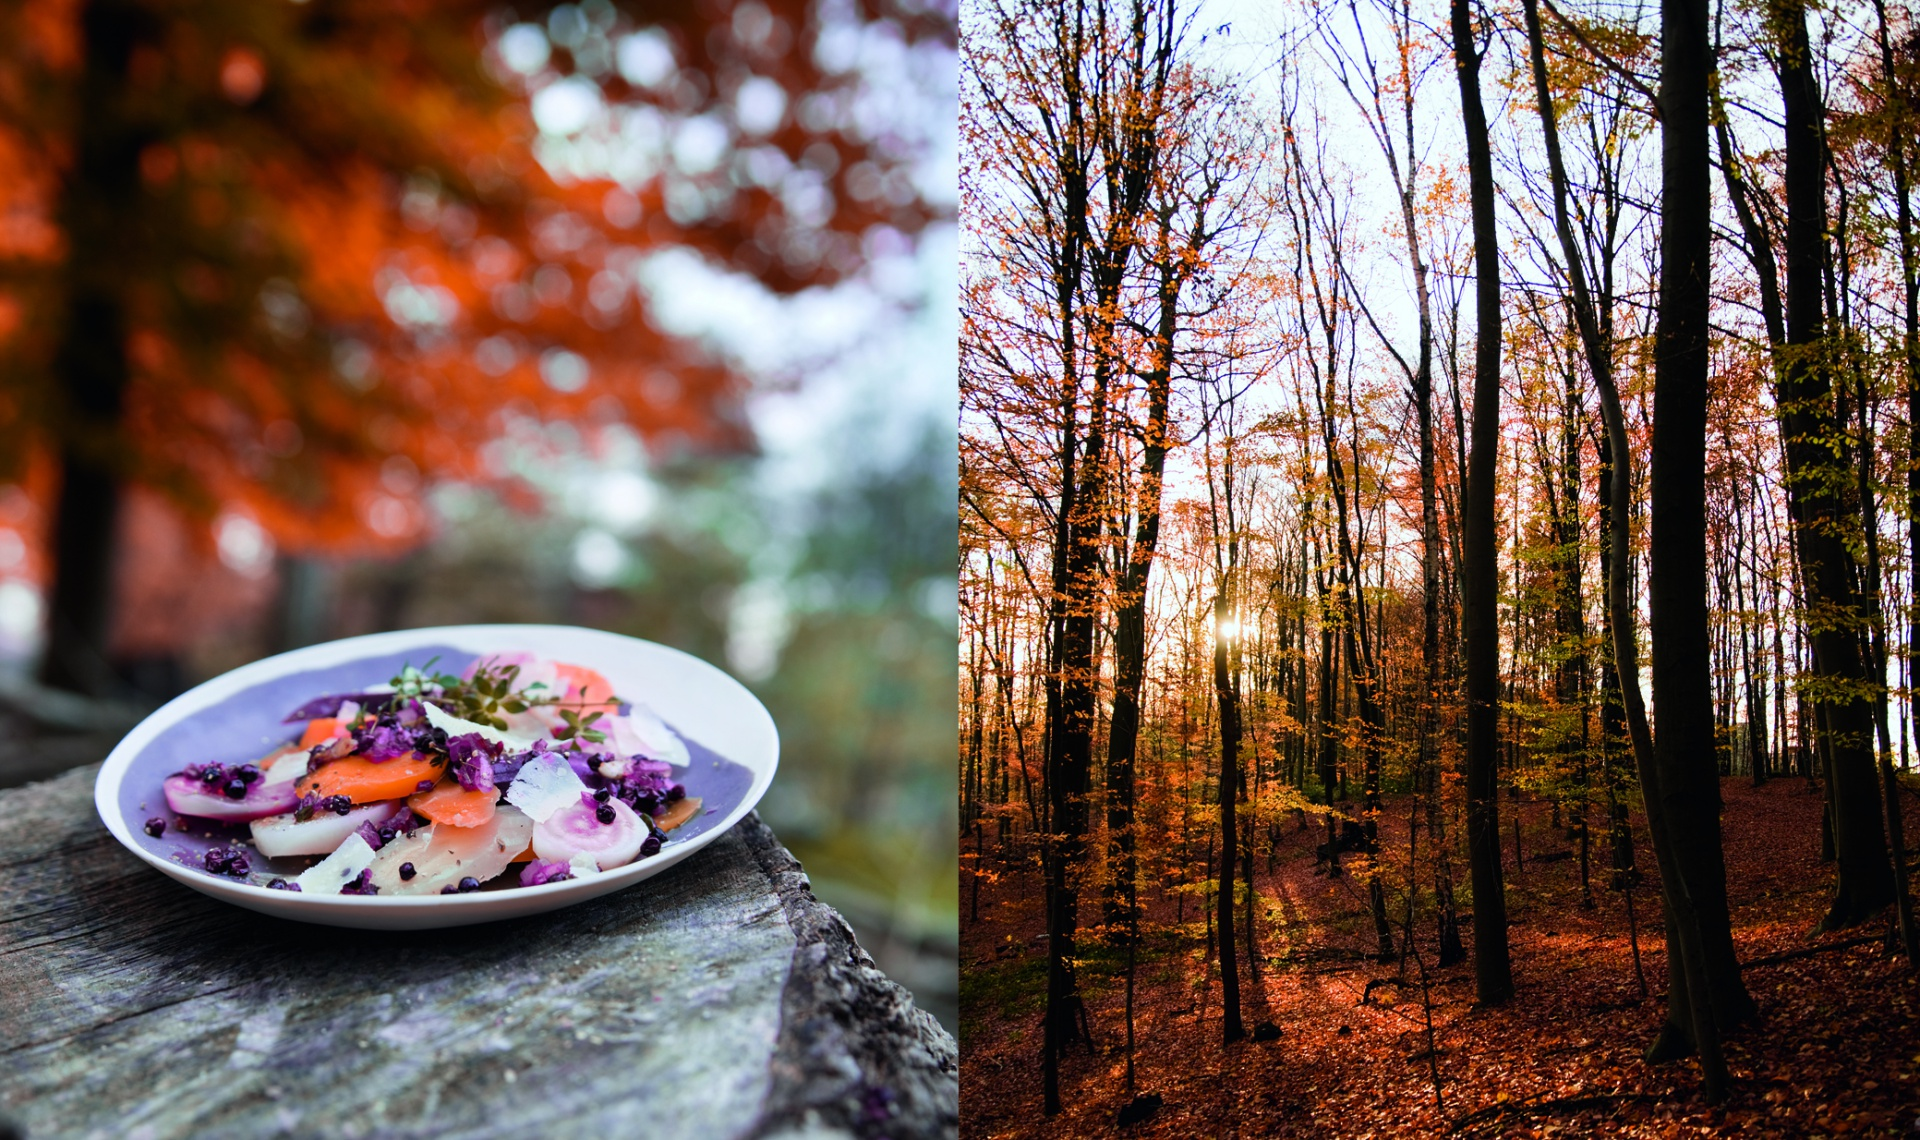 Leichte Sommerküche Claudia Seifert : Foodstyling claudia seifert foodstylistin aus hamburg